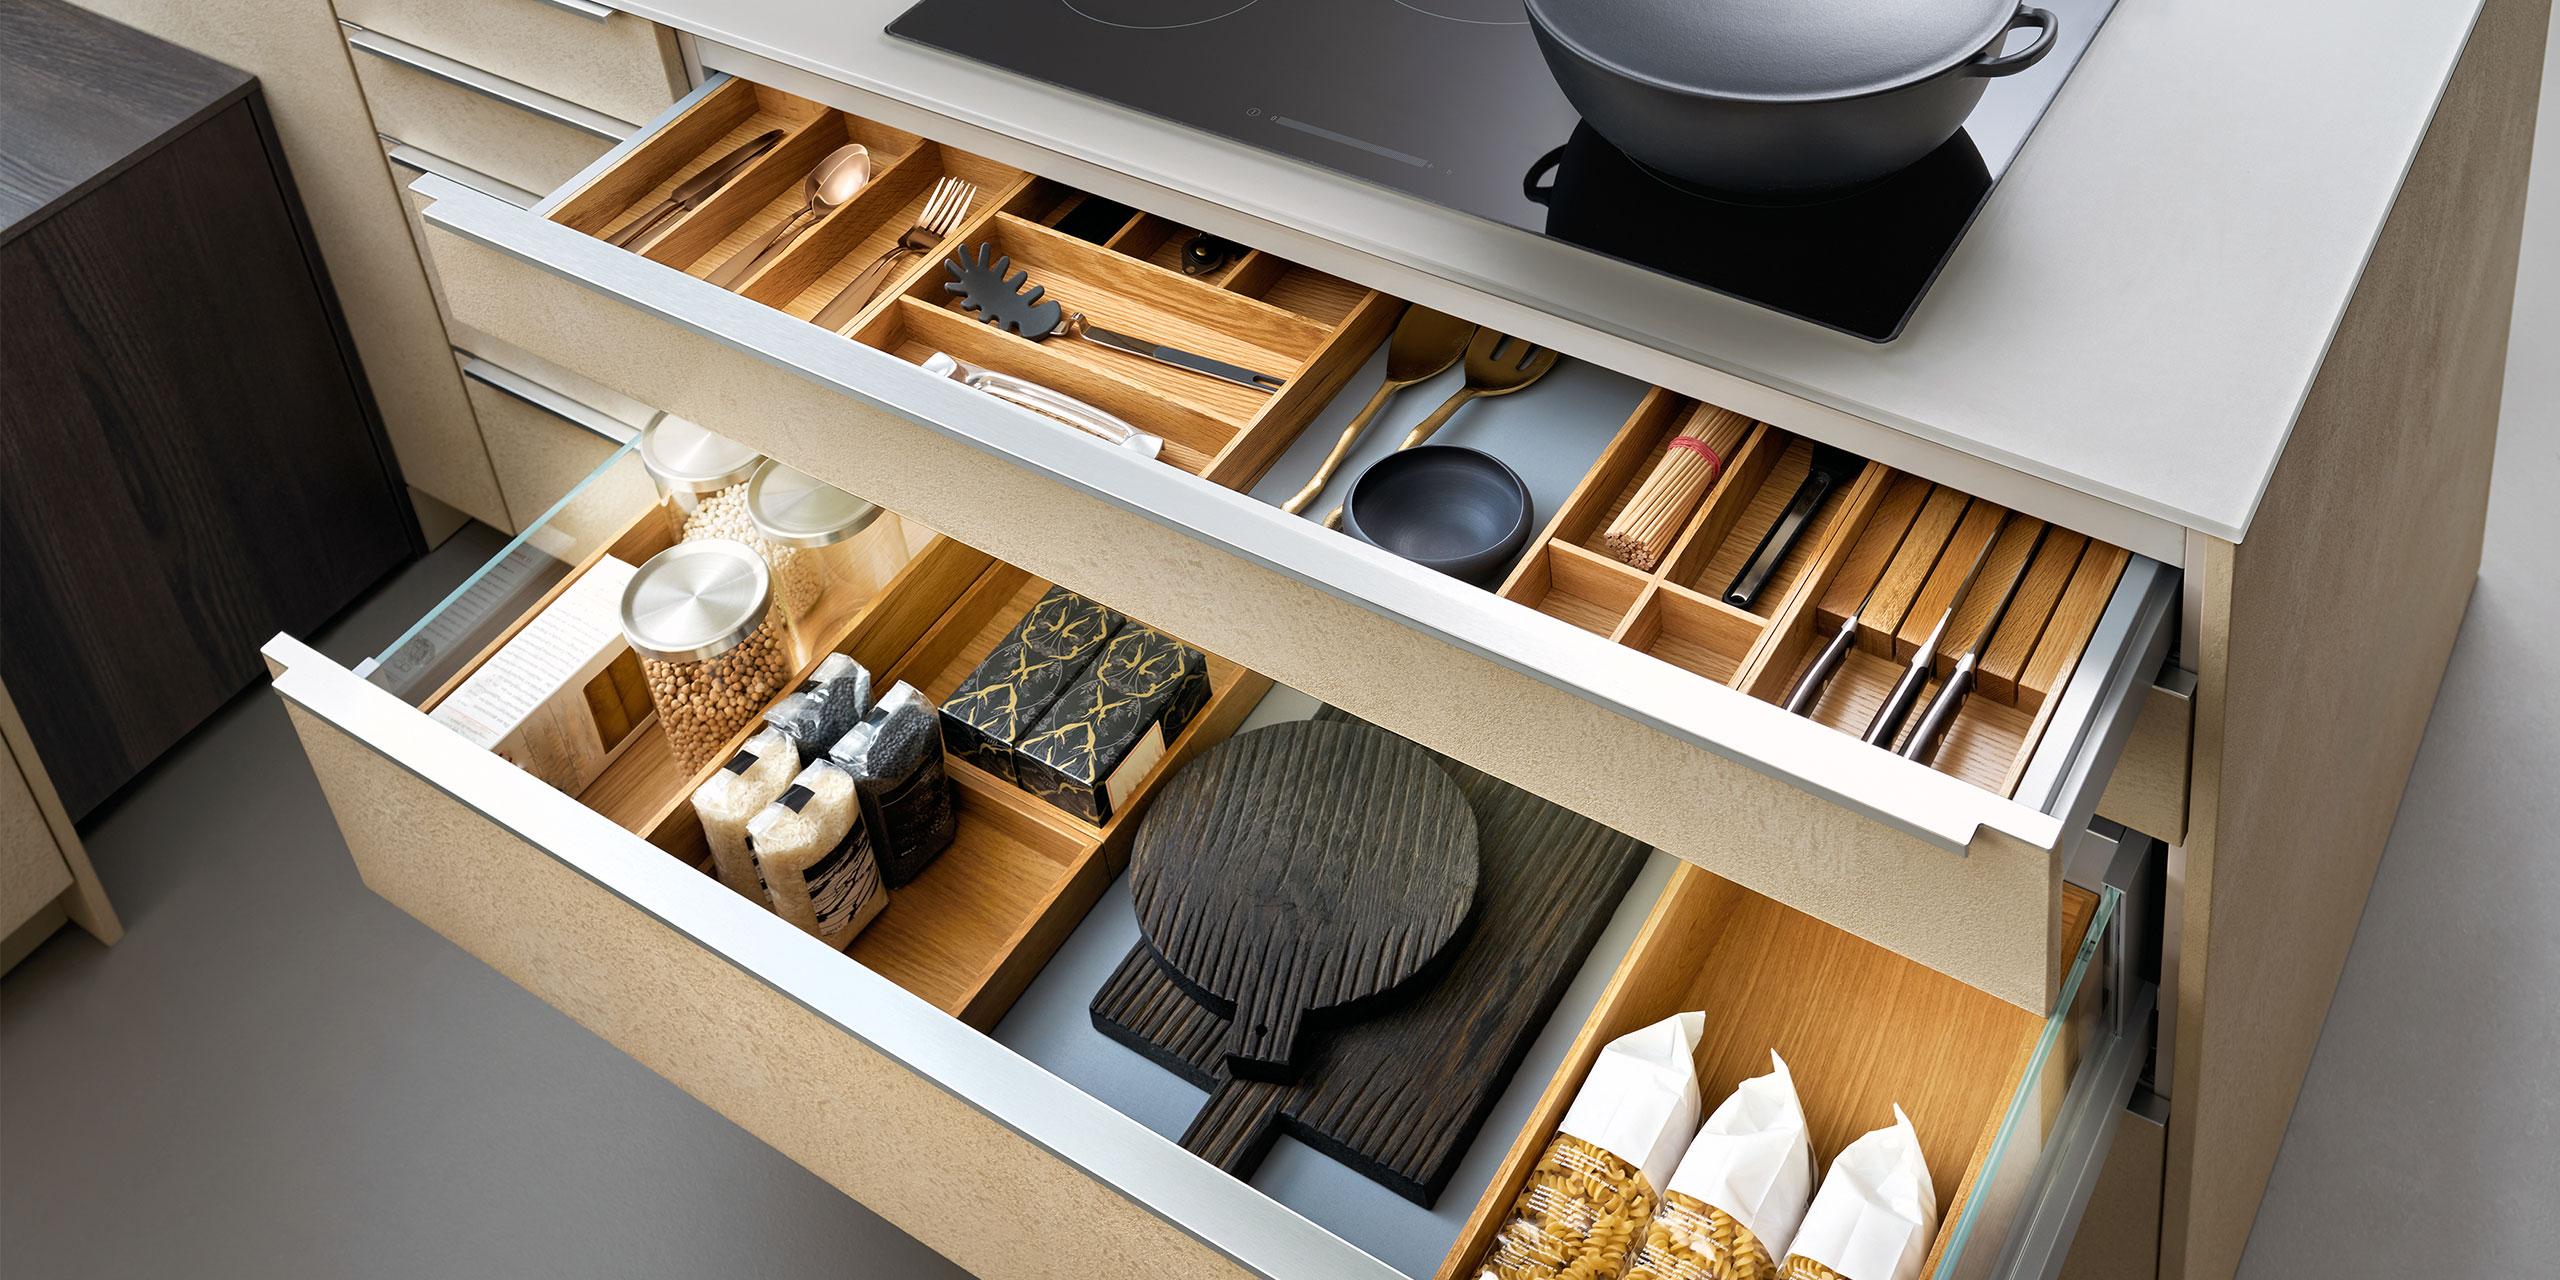 Cutlery Tray - Storage Tips